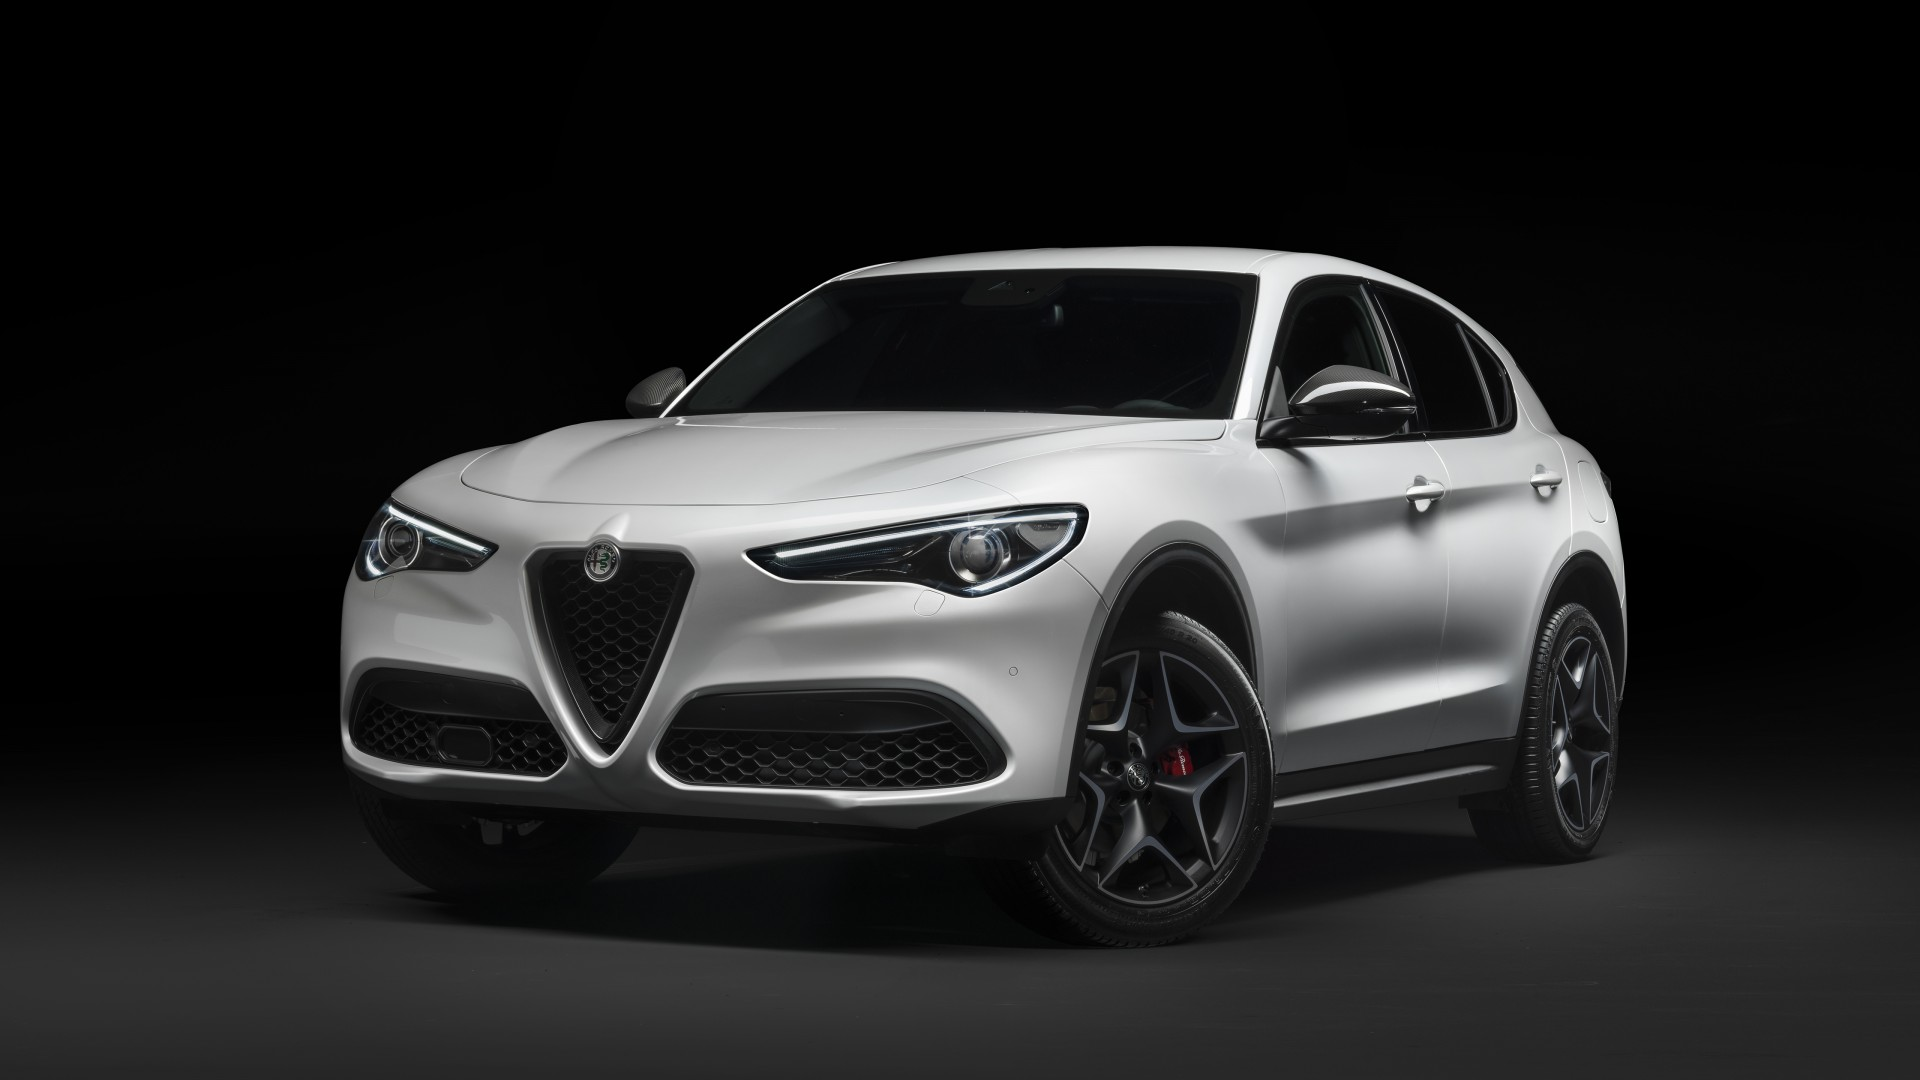 Widescreen Car Wallpaper Alfa Romeo Stelvio Ti 2019 5k Wallpaper Hd Car